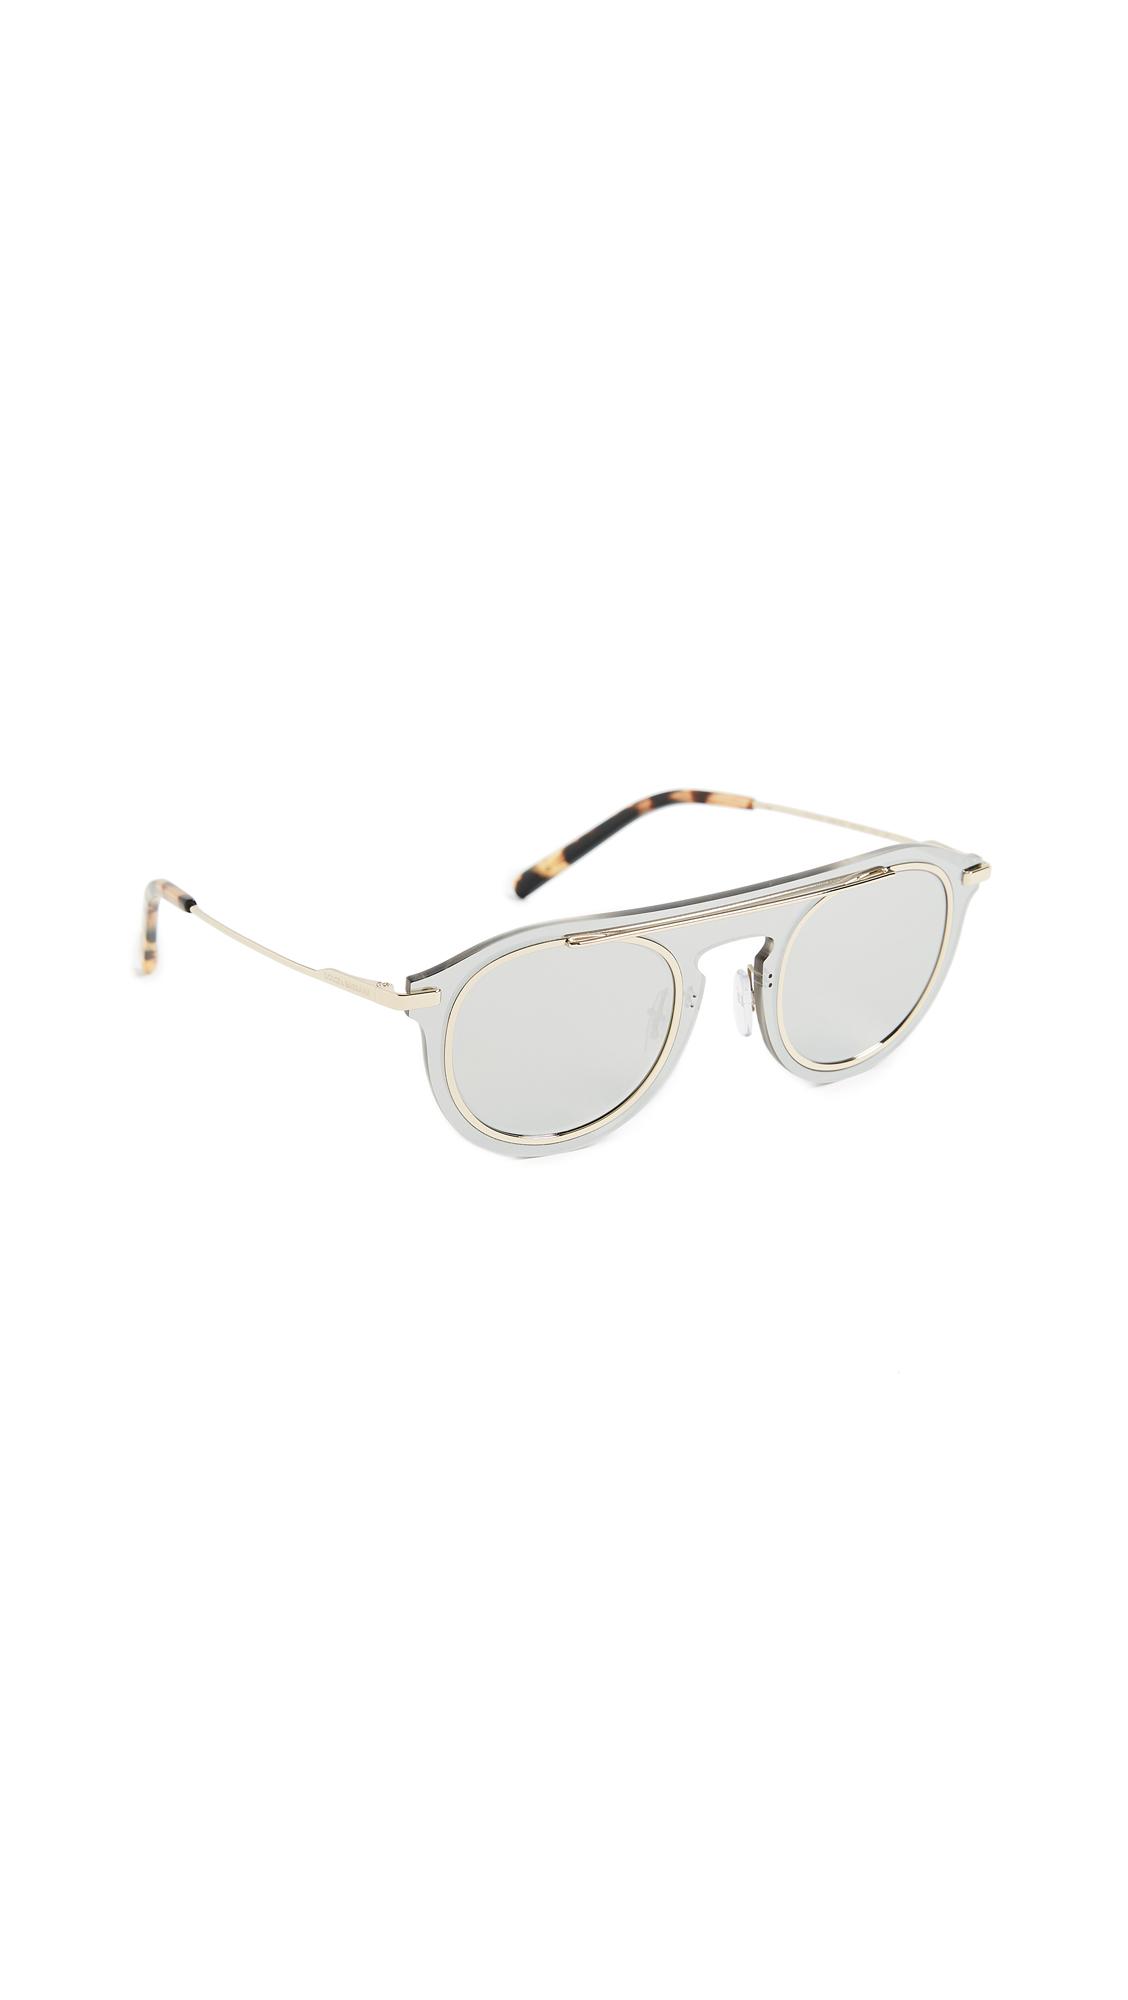 c3f3d7d3eb59 Dolce   Gabbana Flat Top Sunglasses